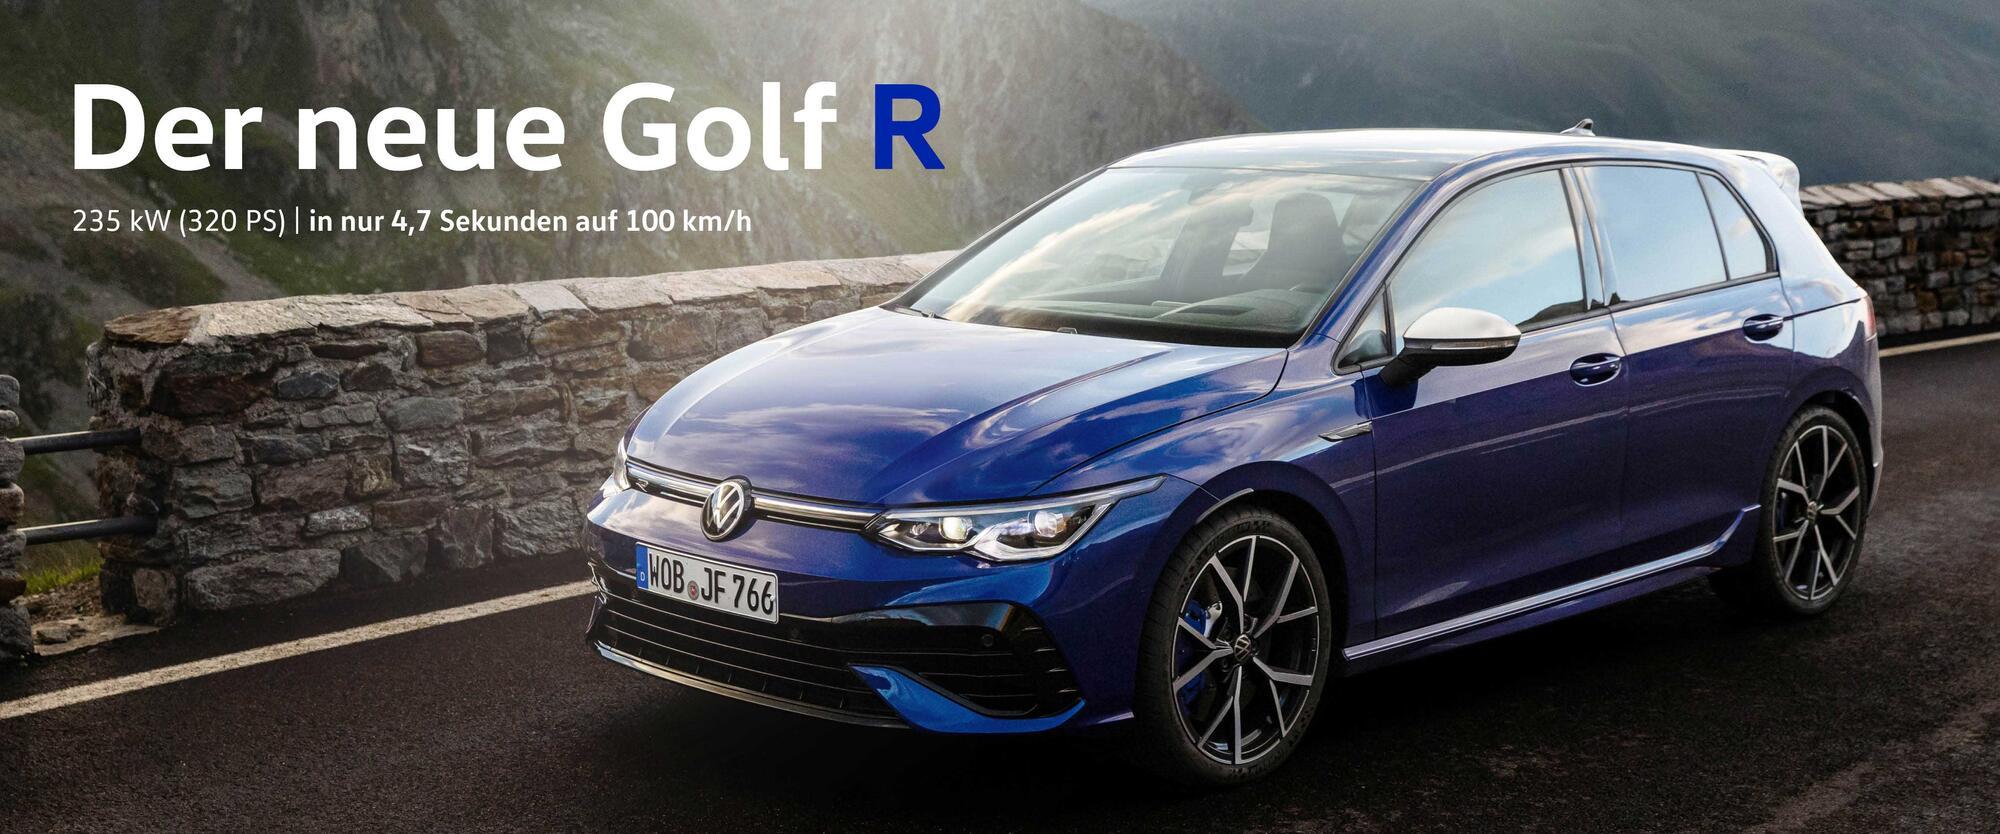 Golf 8 R